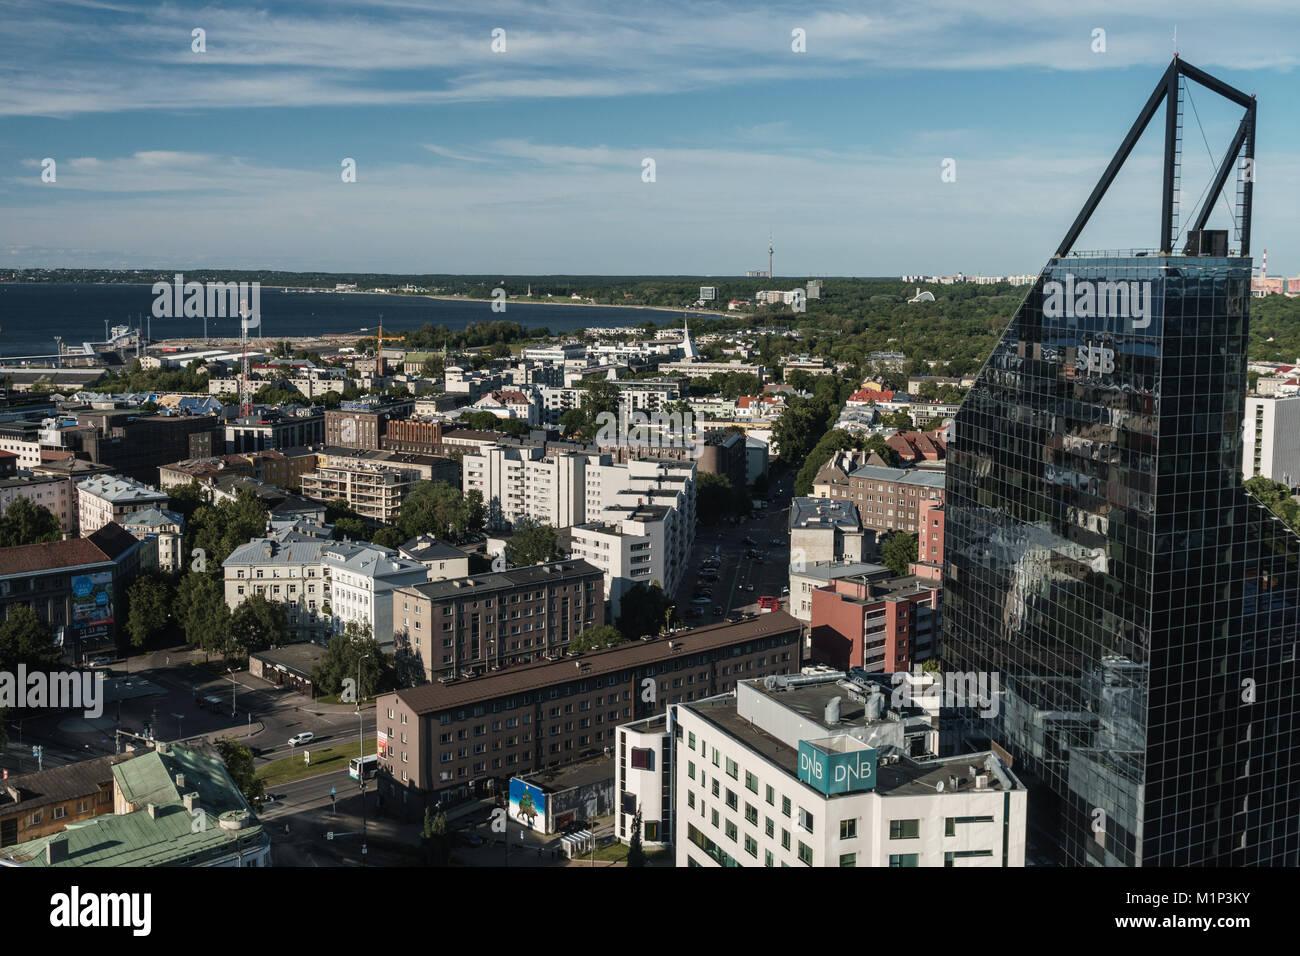 Cityscape of modern buildings and Baltic Sea, Tallinn, Estonia, Europe - Stock Image